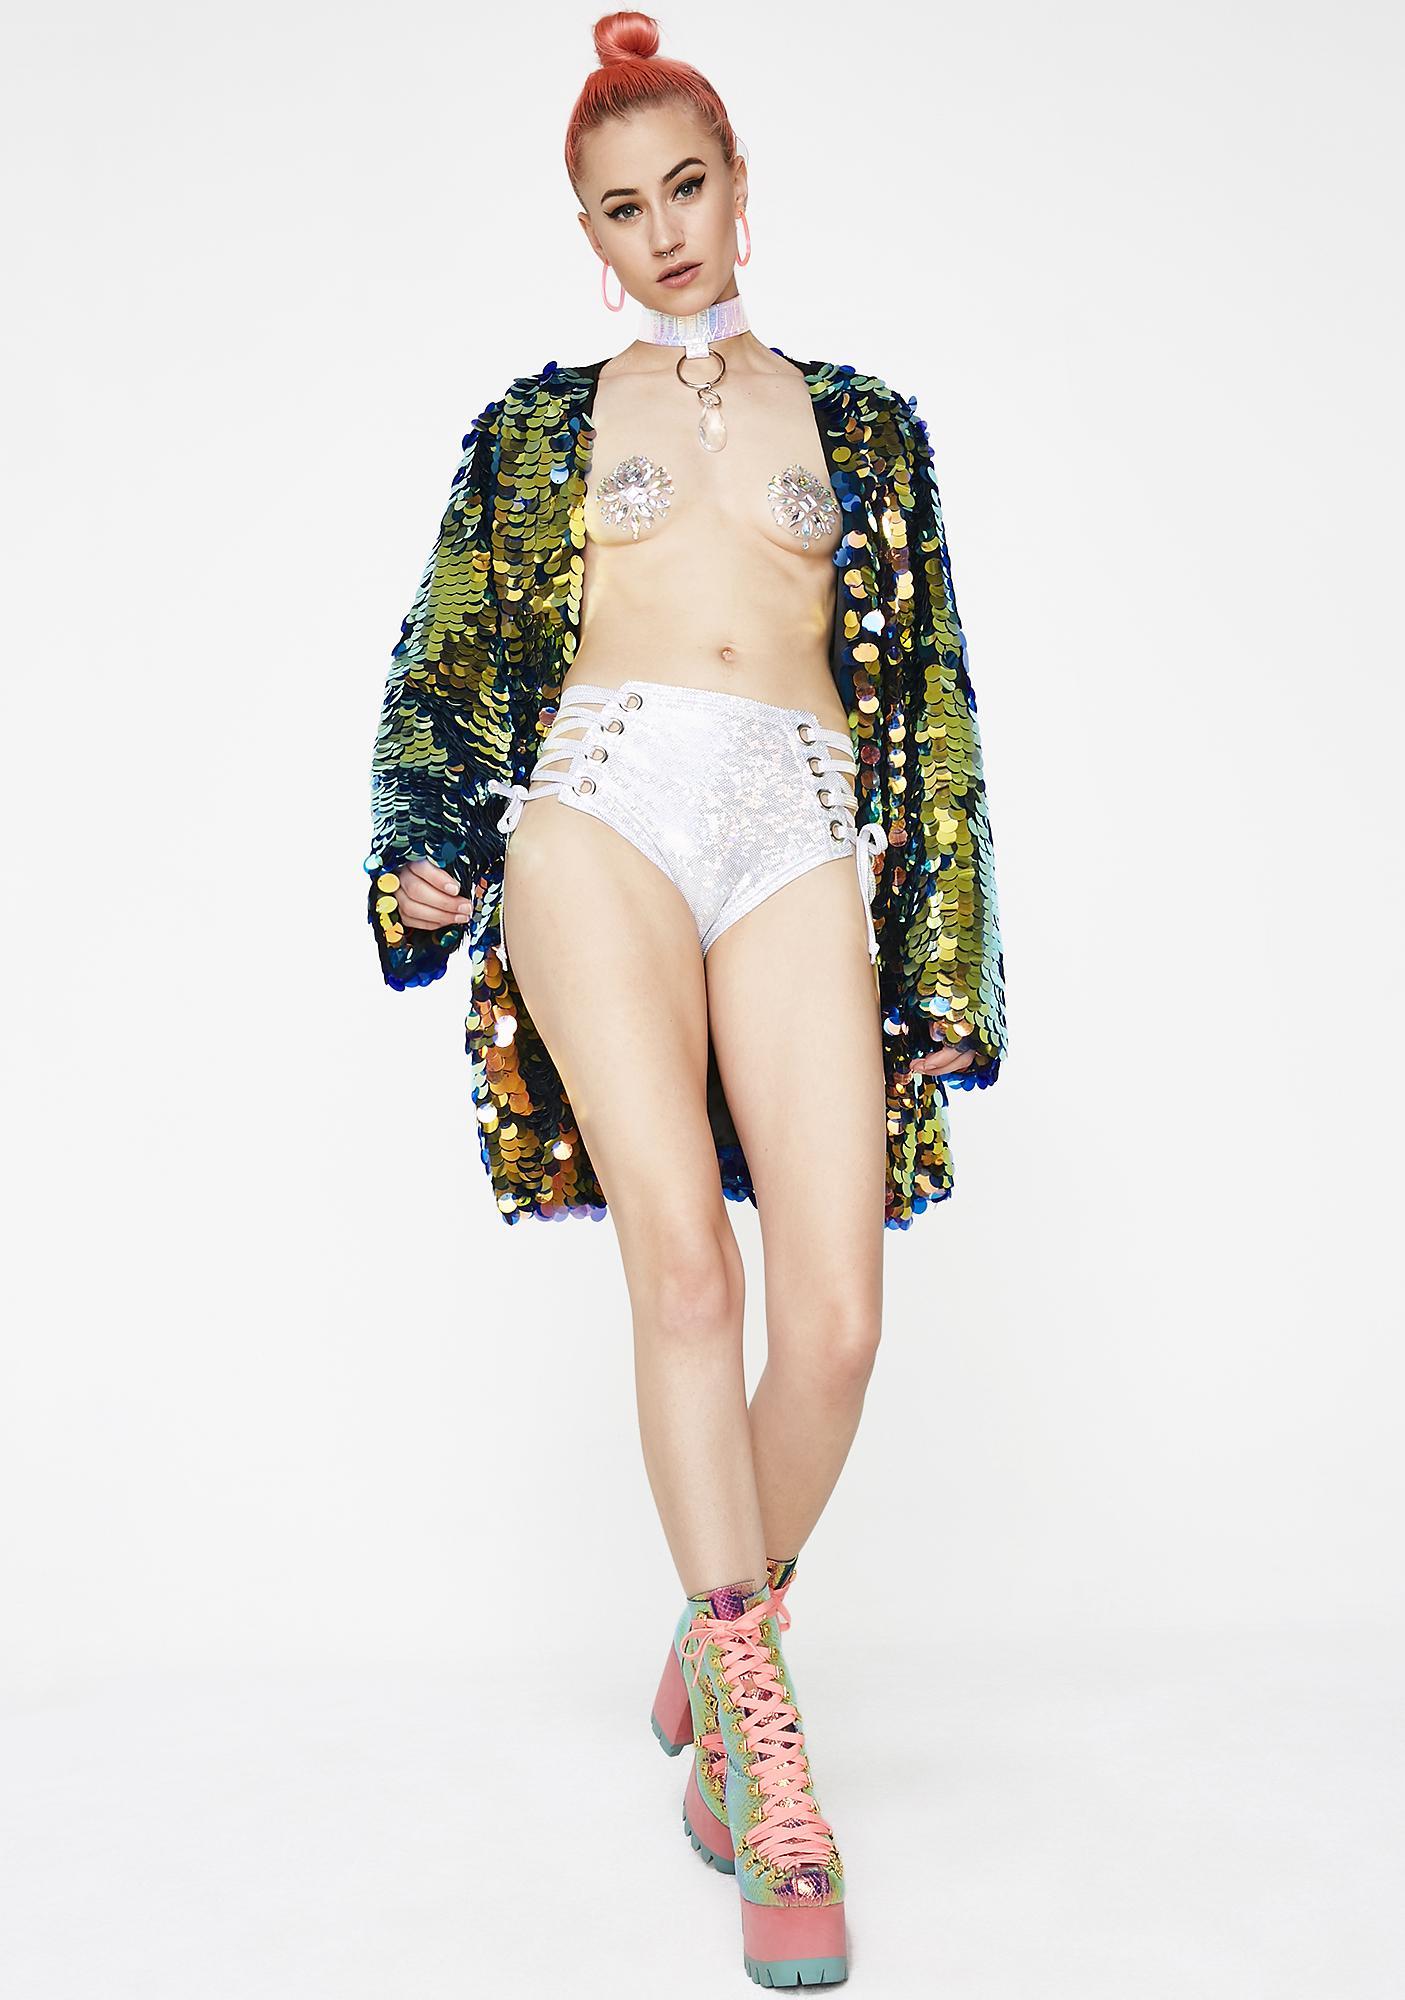 Rolita Rave Couture Hologram Lace Me Up Shorts